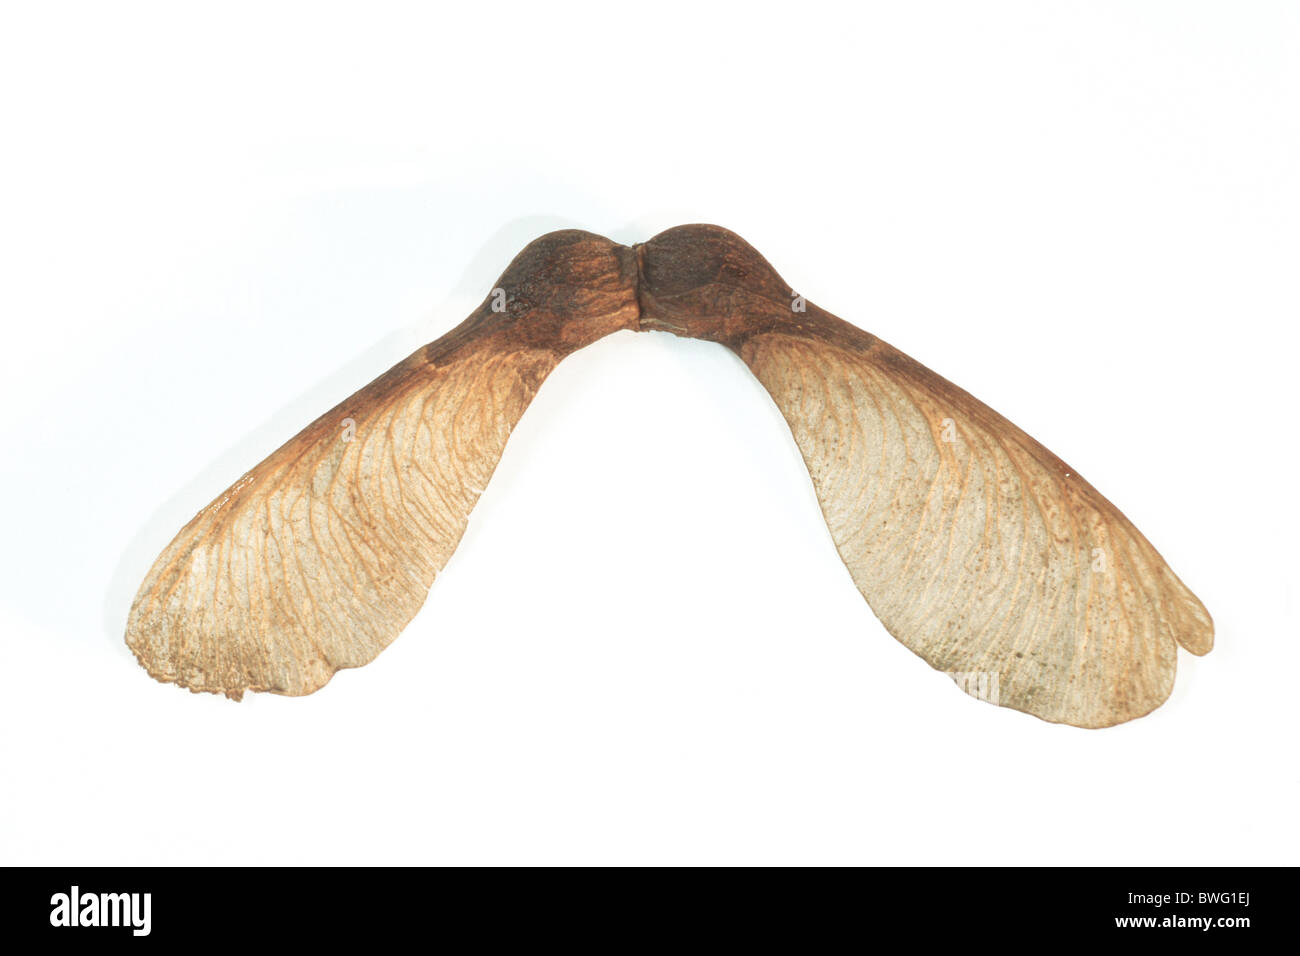 Sicomoro sicomoro, el arce (Acer pseudoplatanus), el arce clave, studio picture. Foto de stock